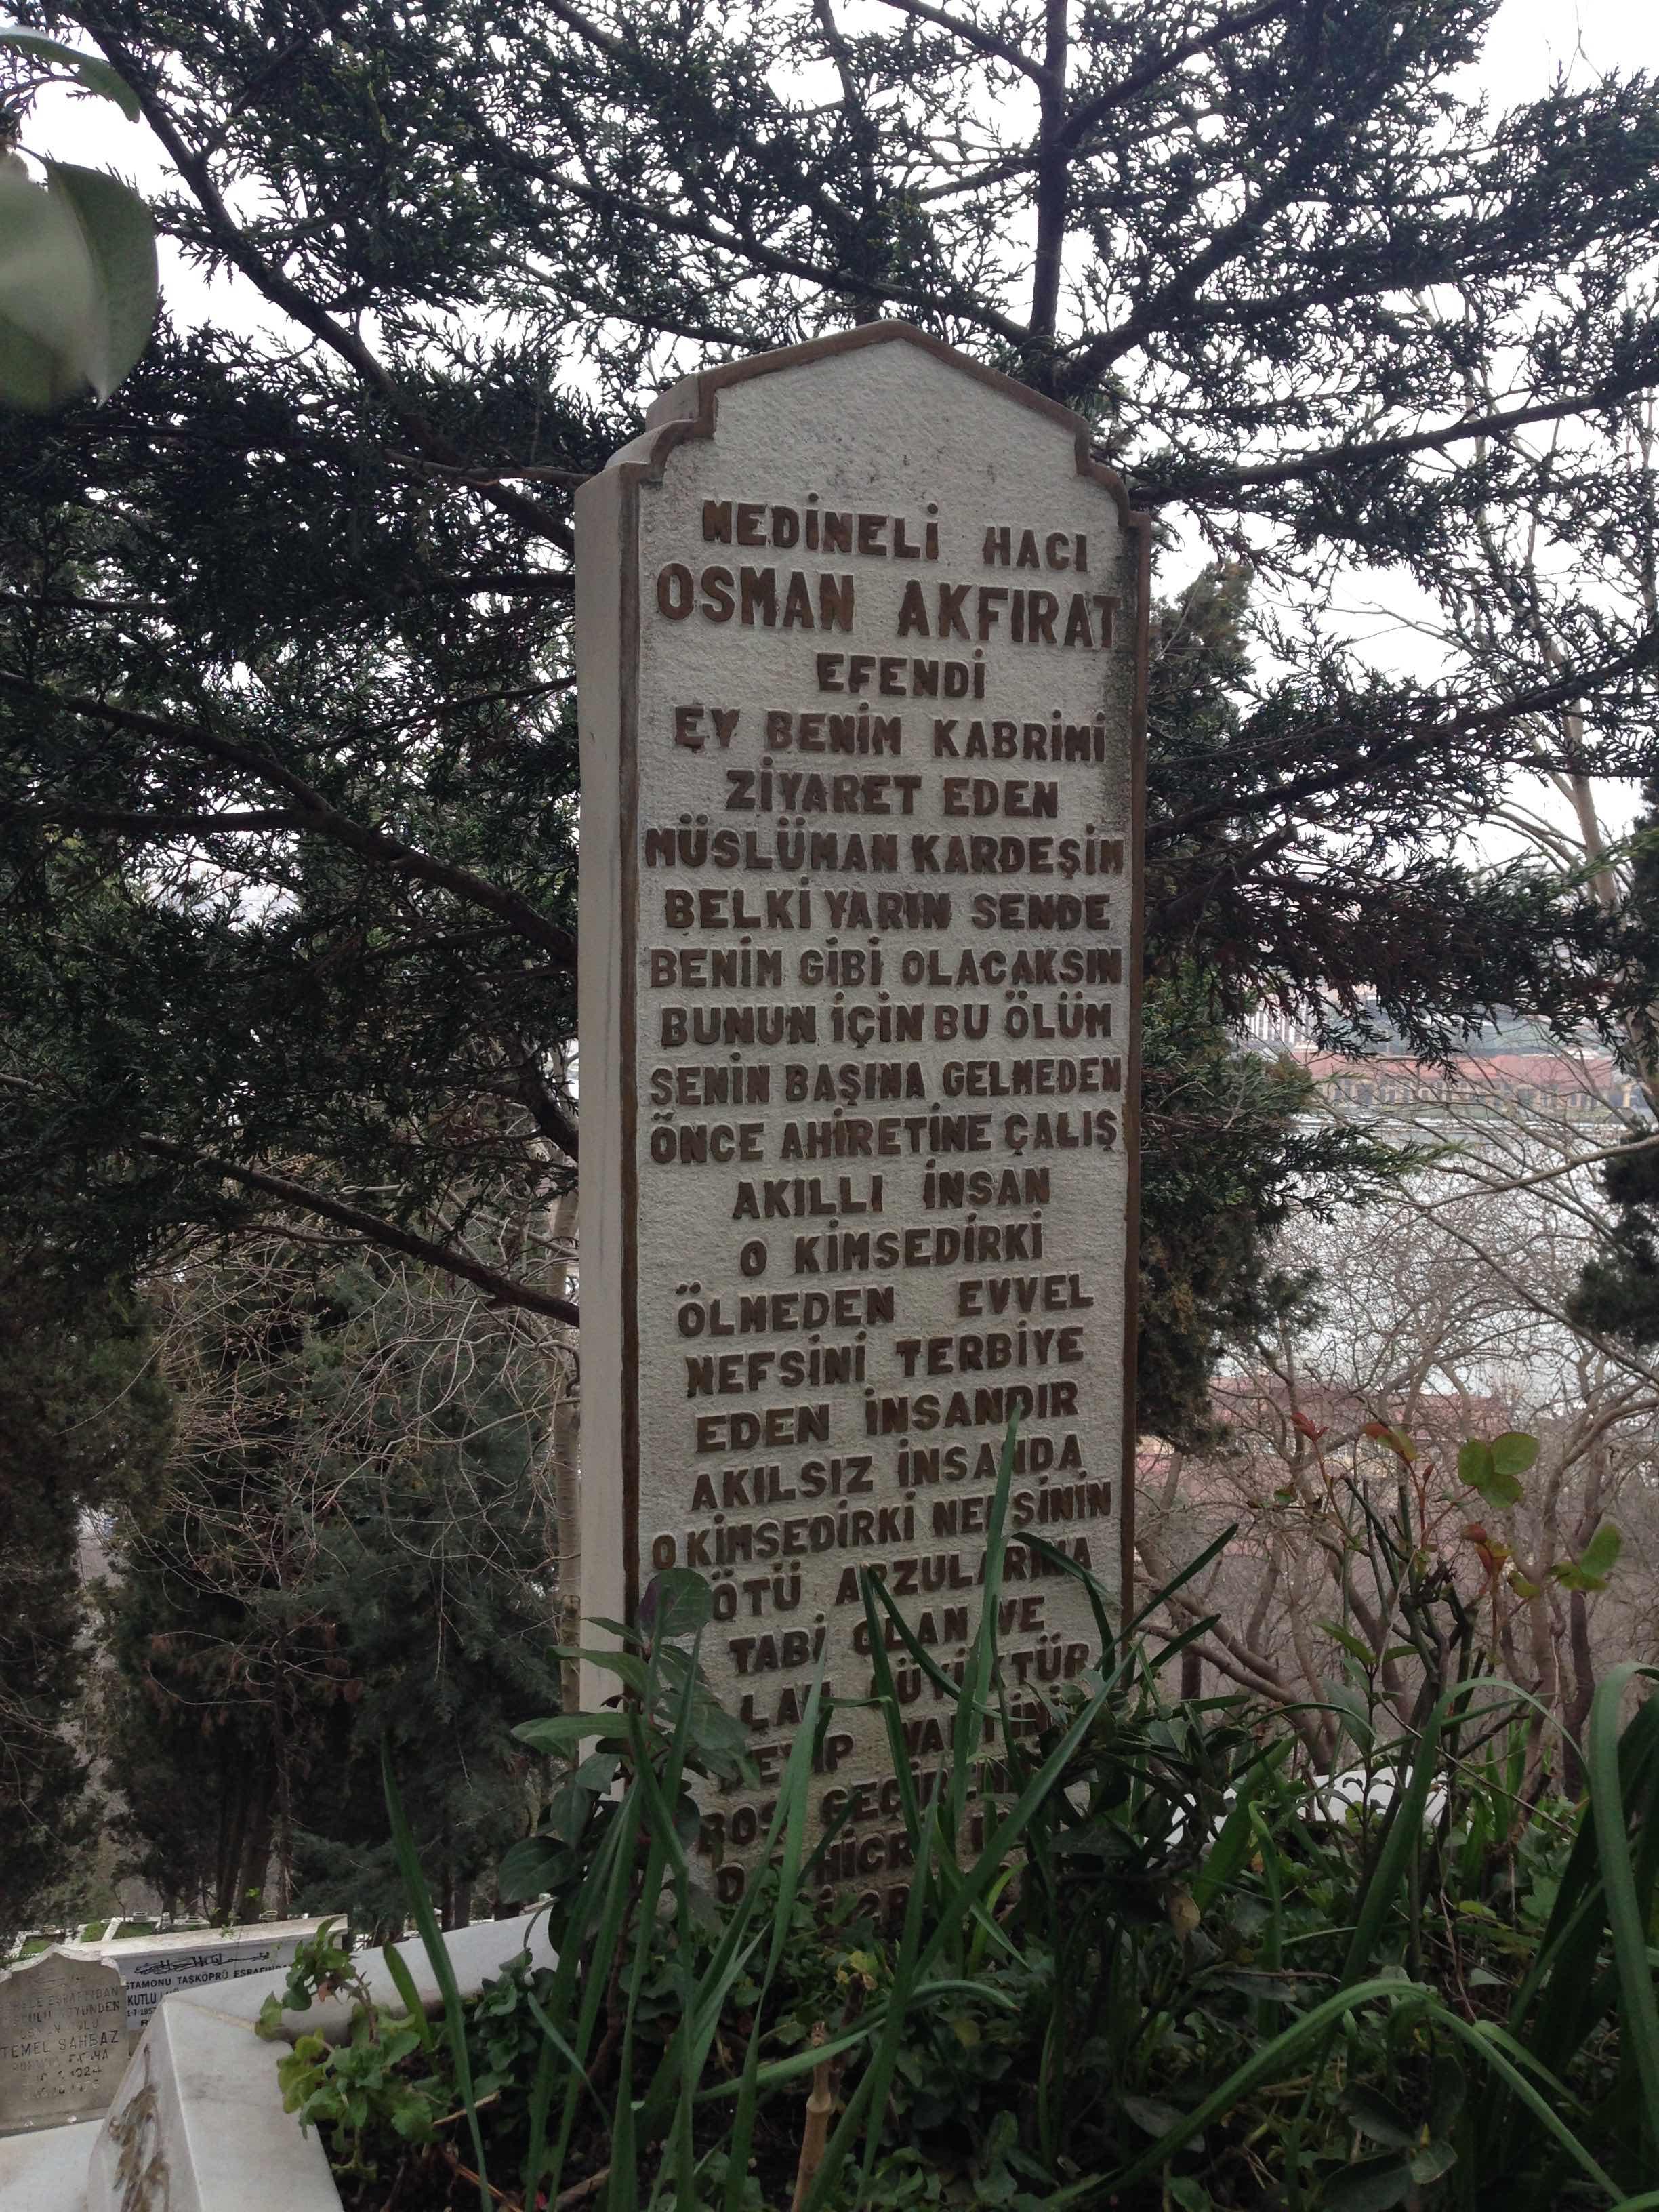 MEDİNELİ HACI OSMAN EFENDİ'DEN SOHBET NOTLARI-5